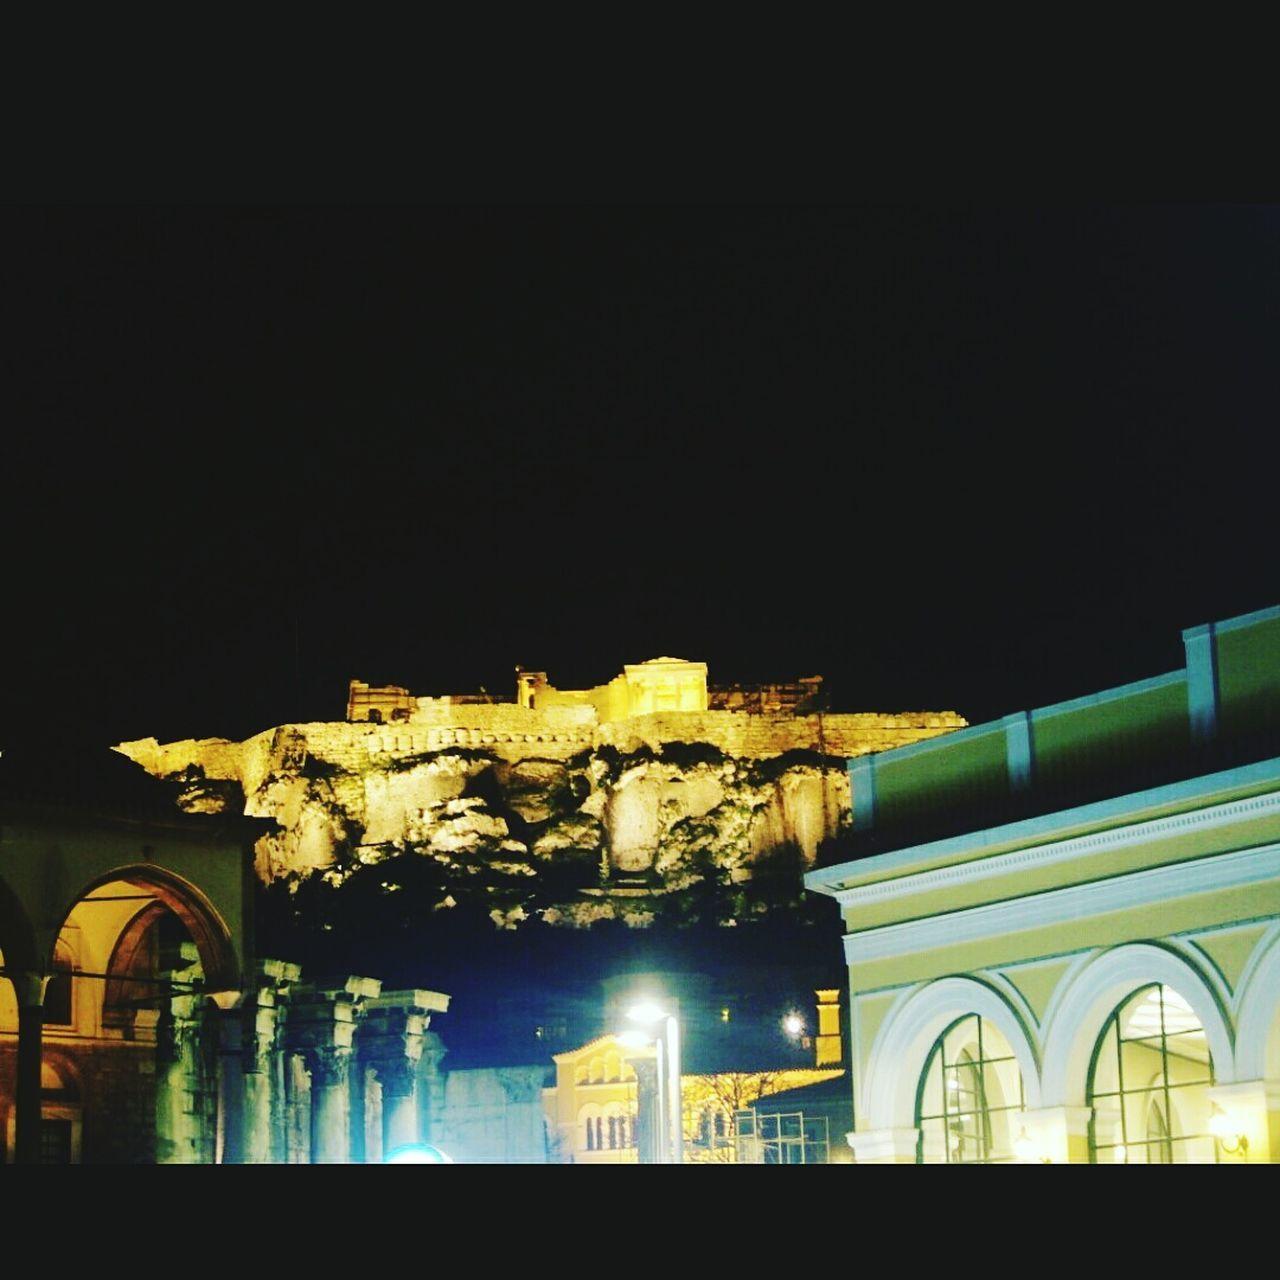 Wheningreece Nightlife City Lights Athens, Greece Monastiraki Parthenon Acropolis Greece Legends